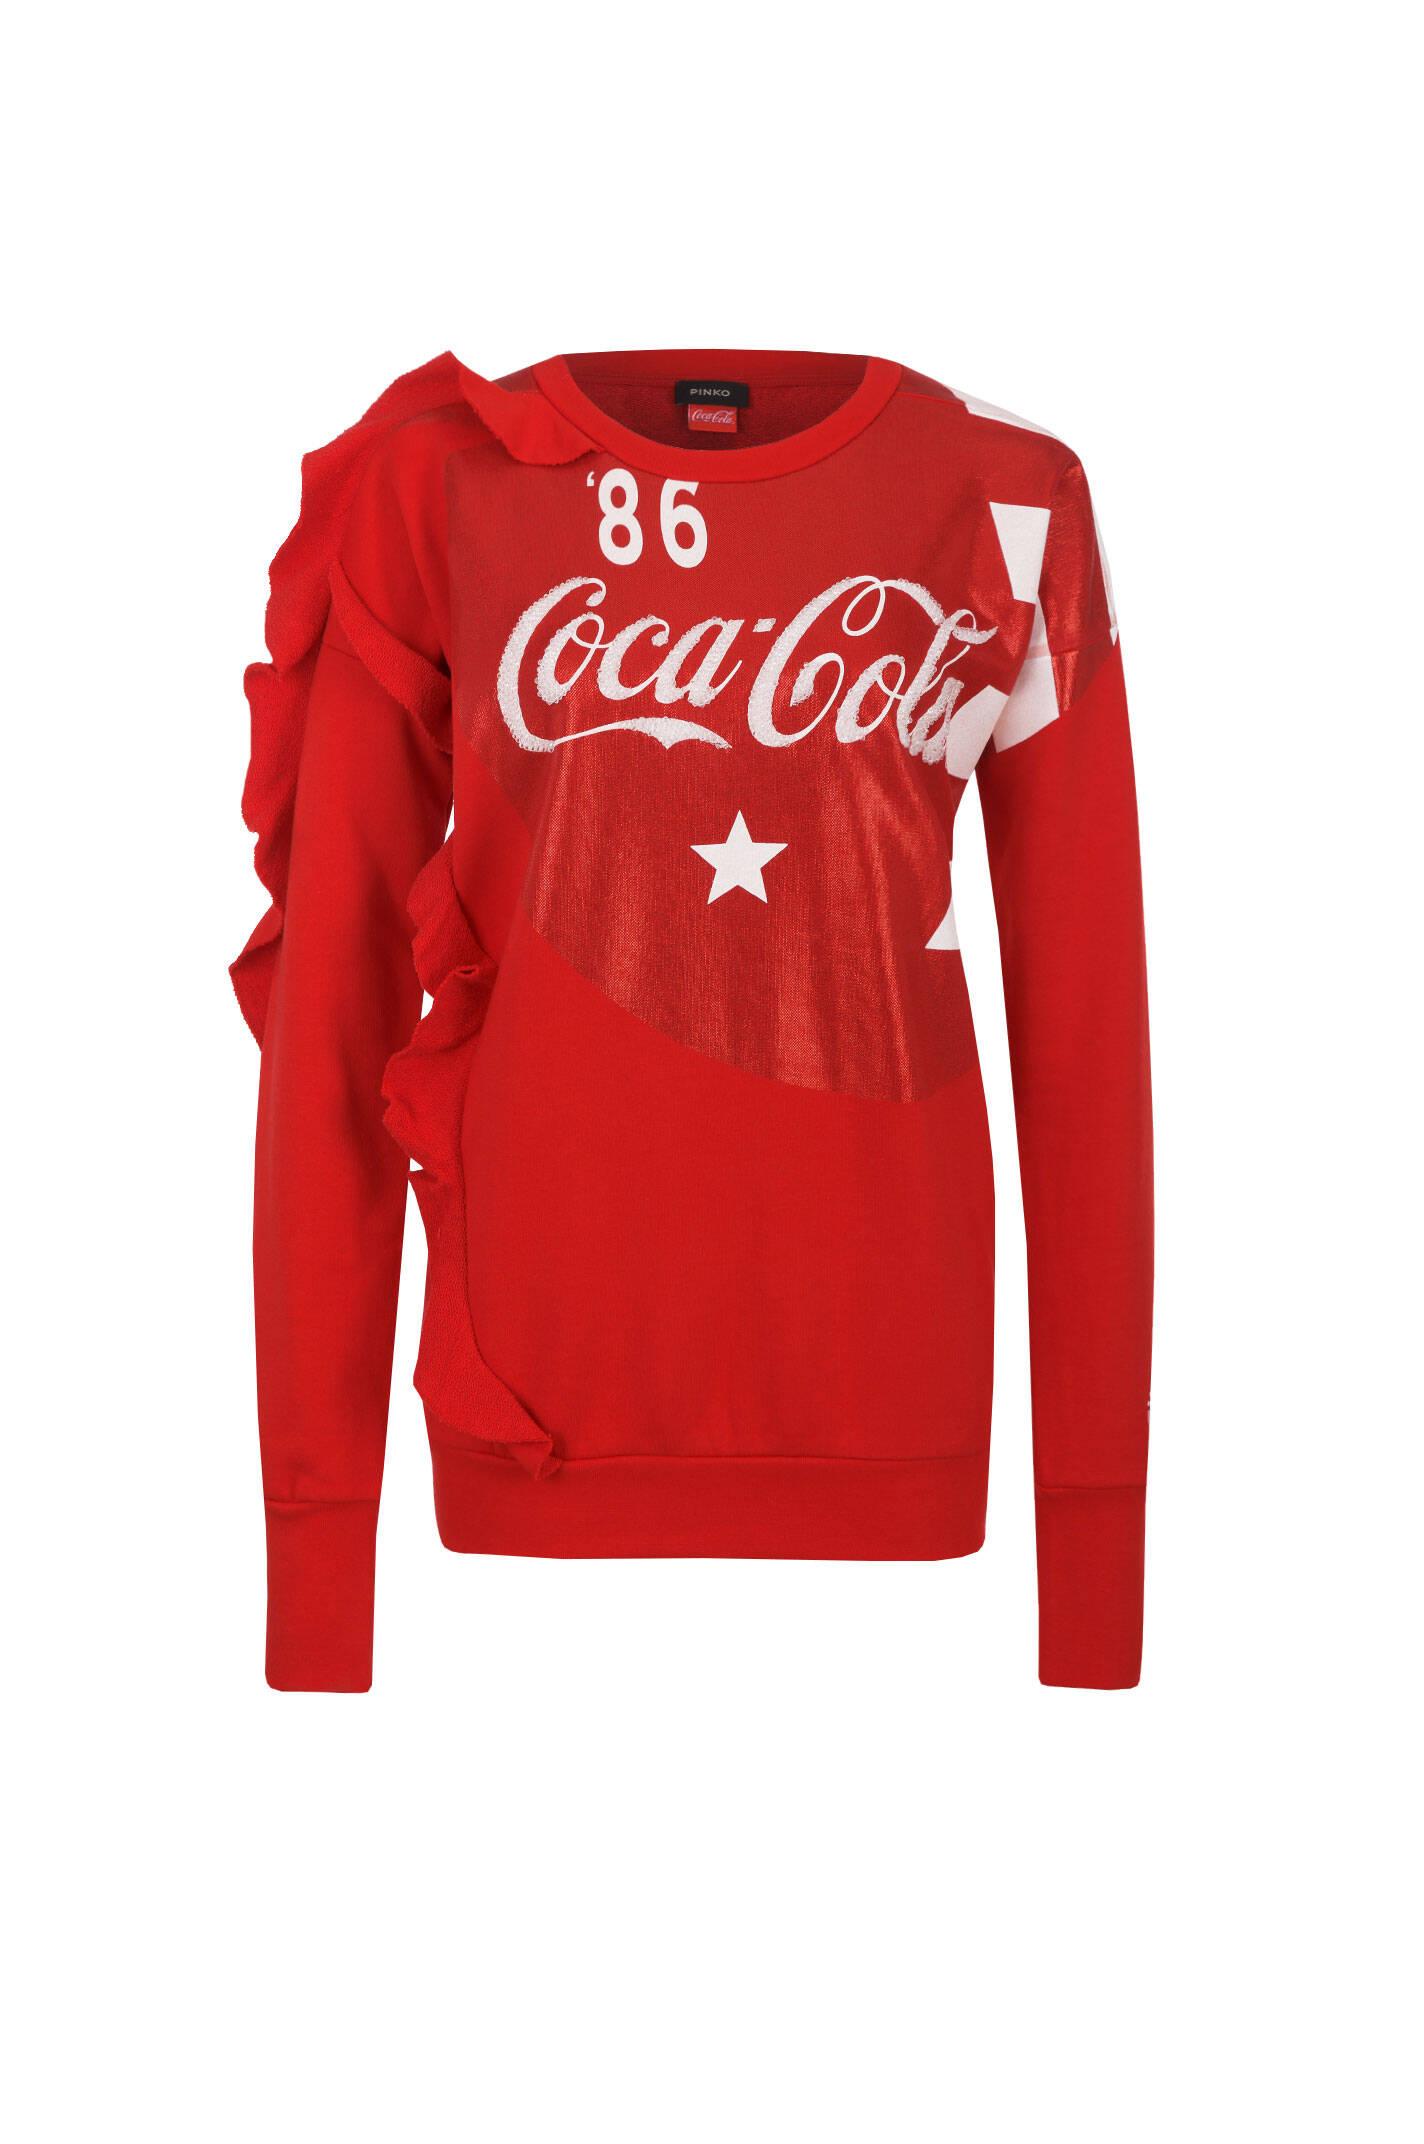 3f92b44162 Crostata Coca-Cola Sweatshirt